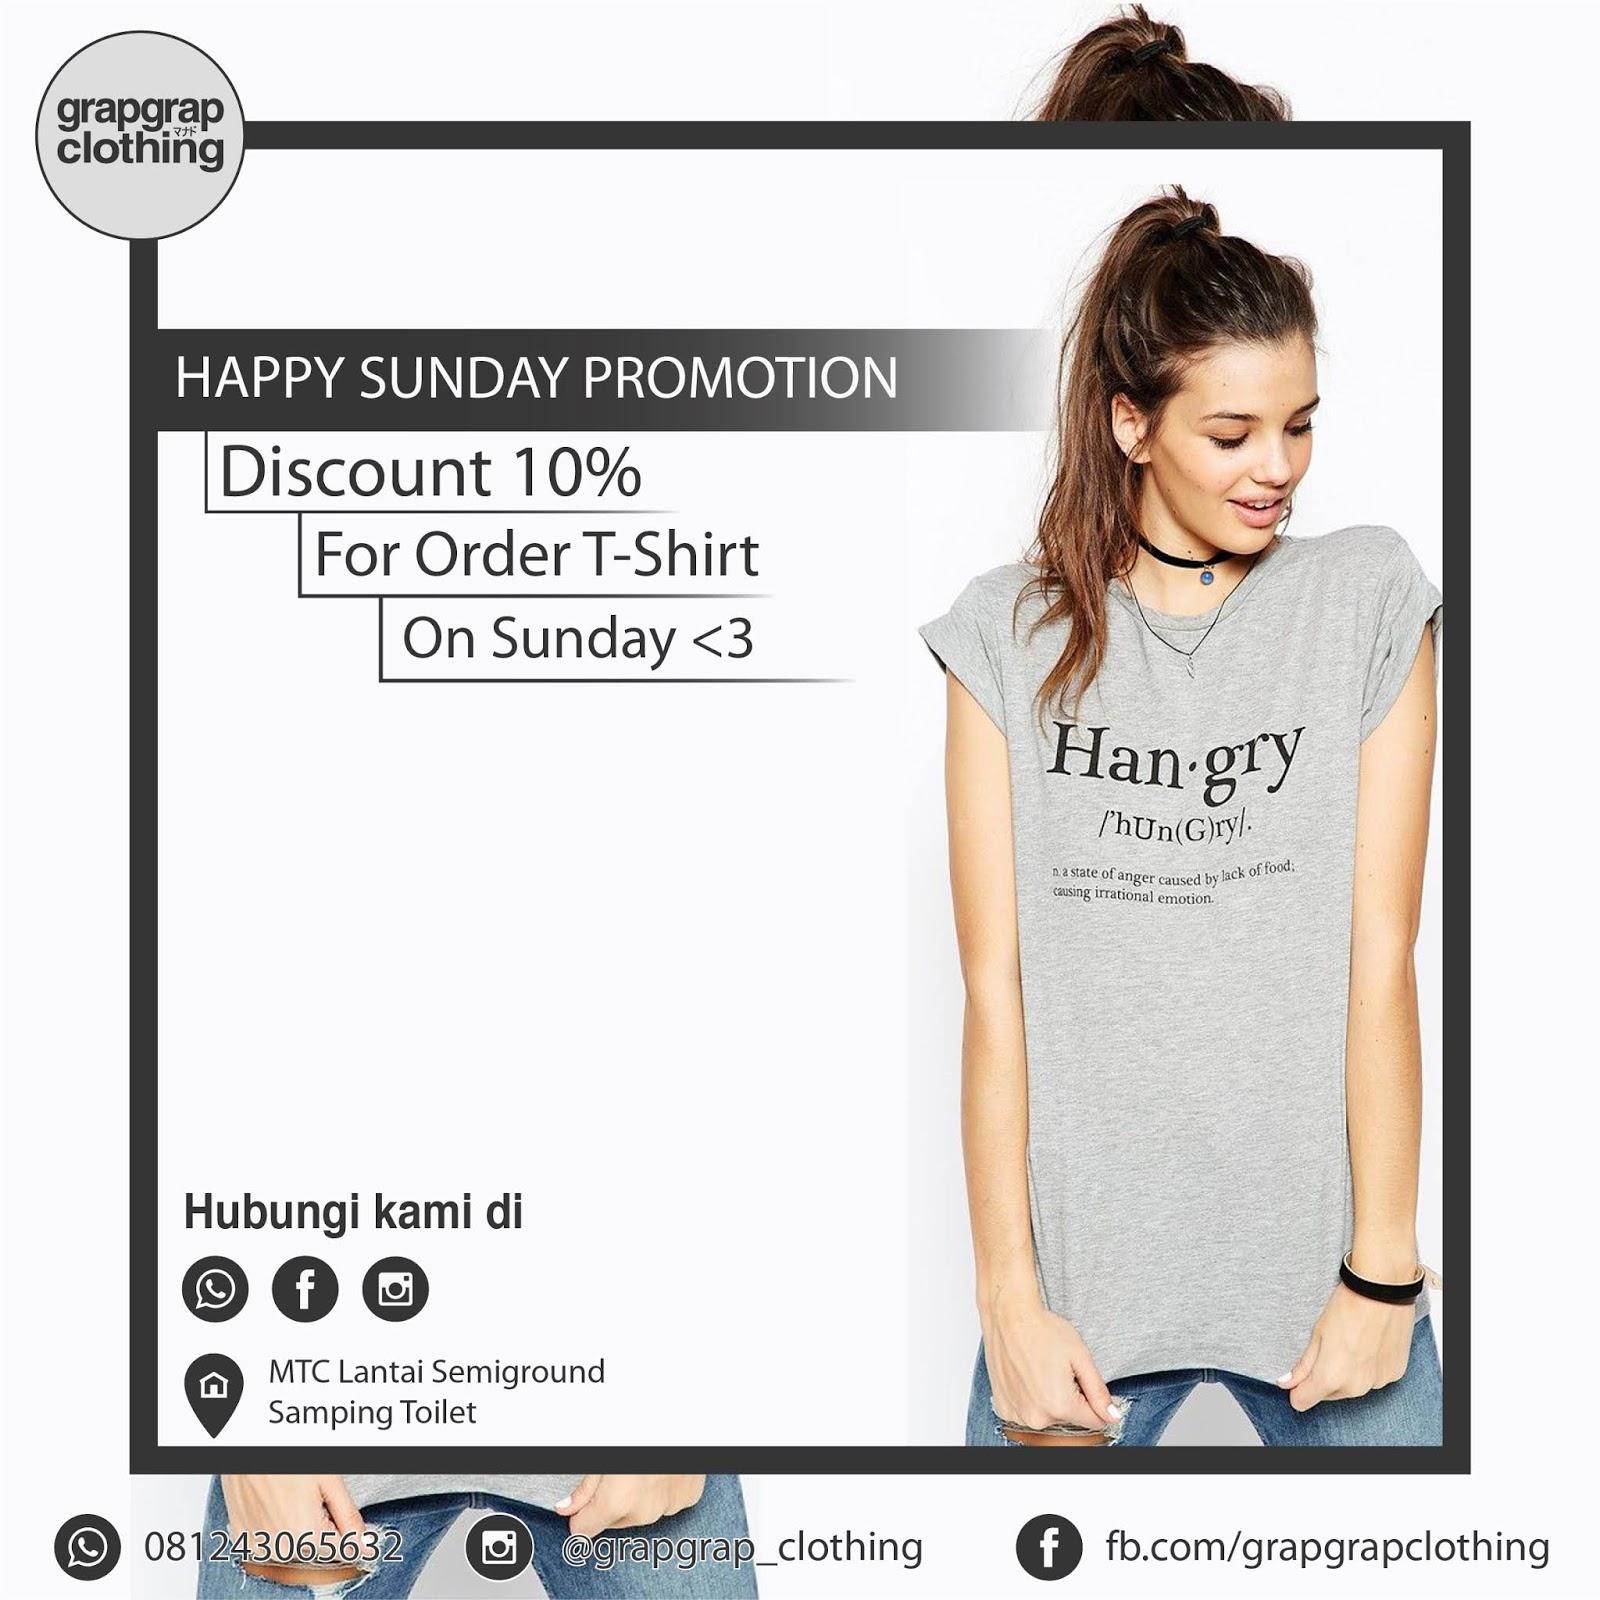 Beking Baju Manado Murah- Sunday Promotion